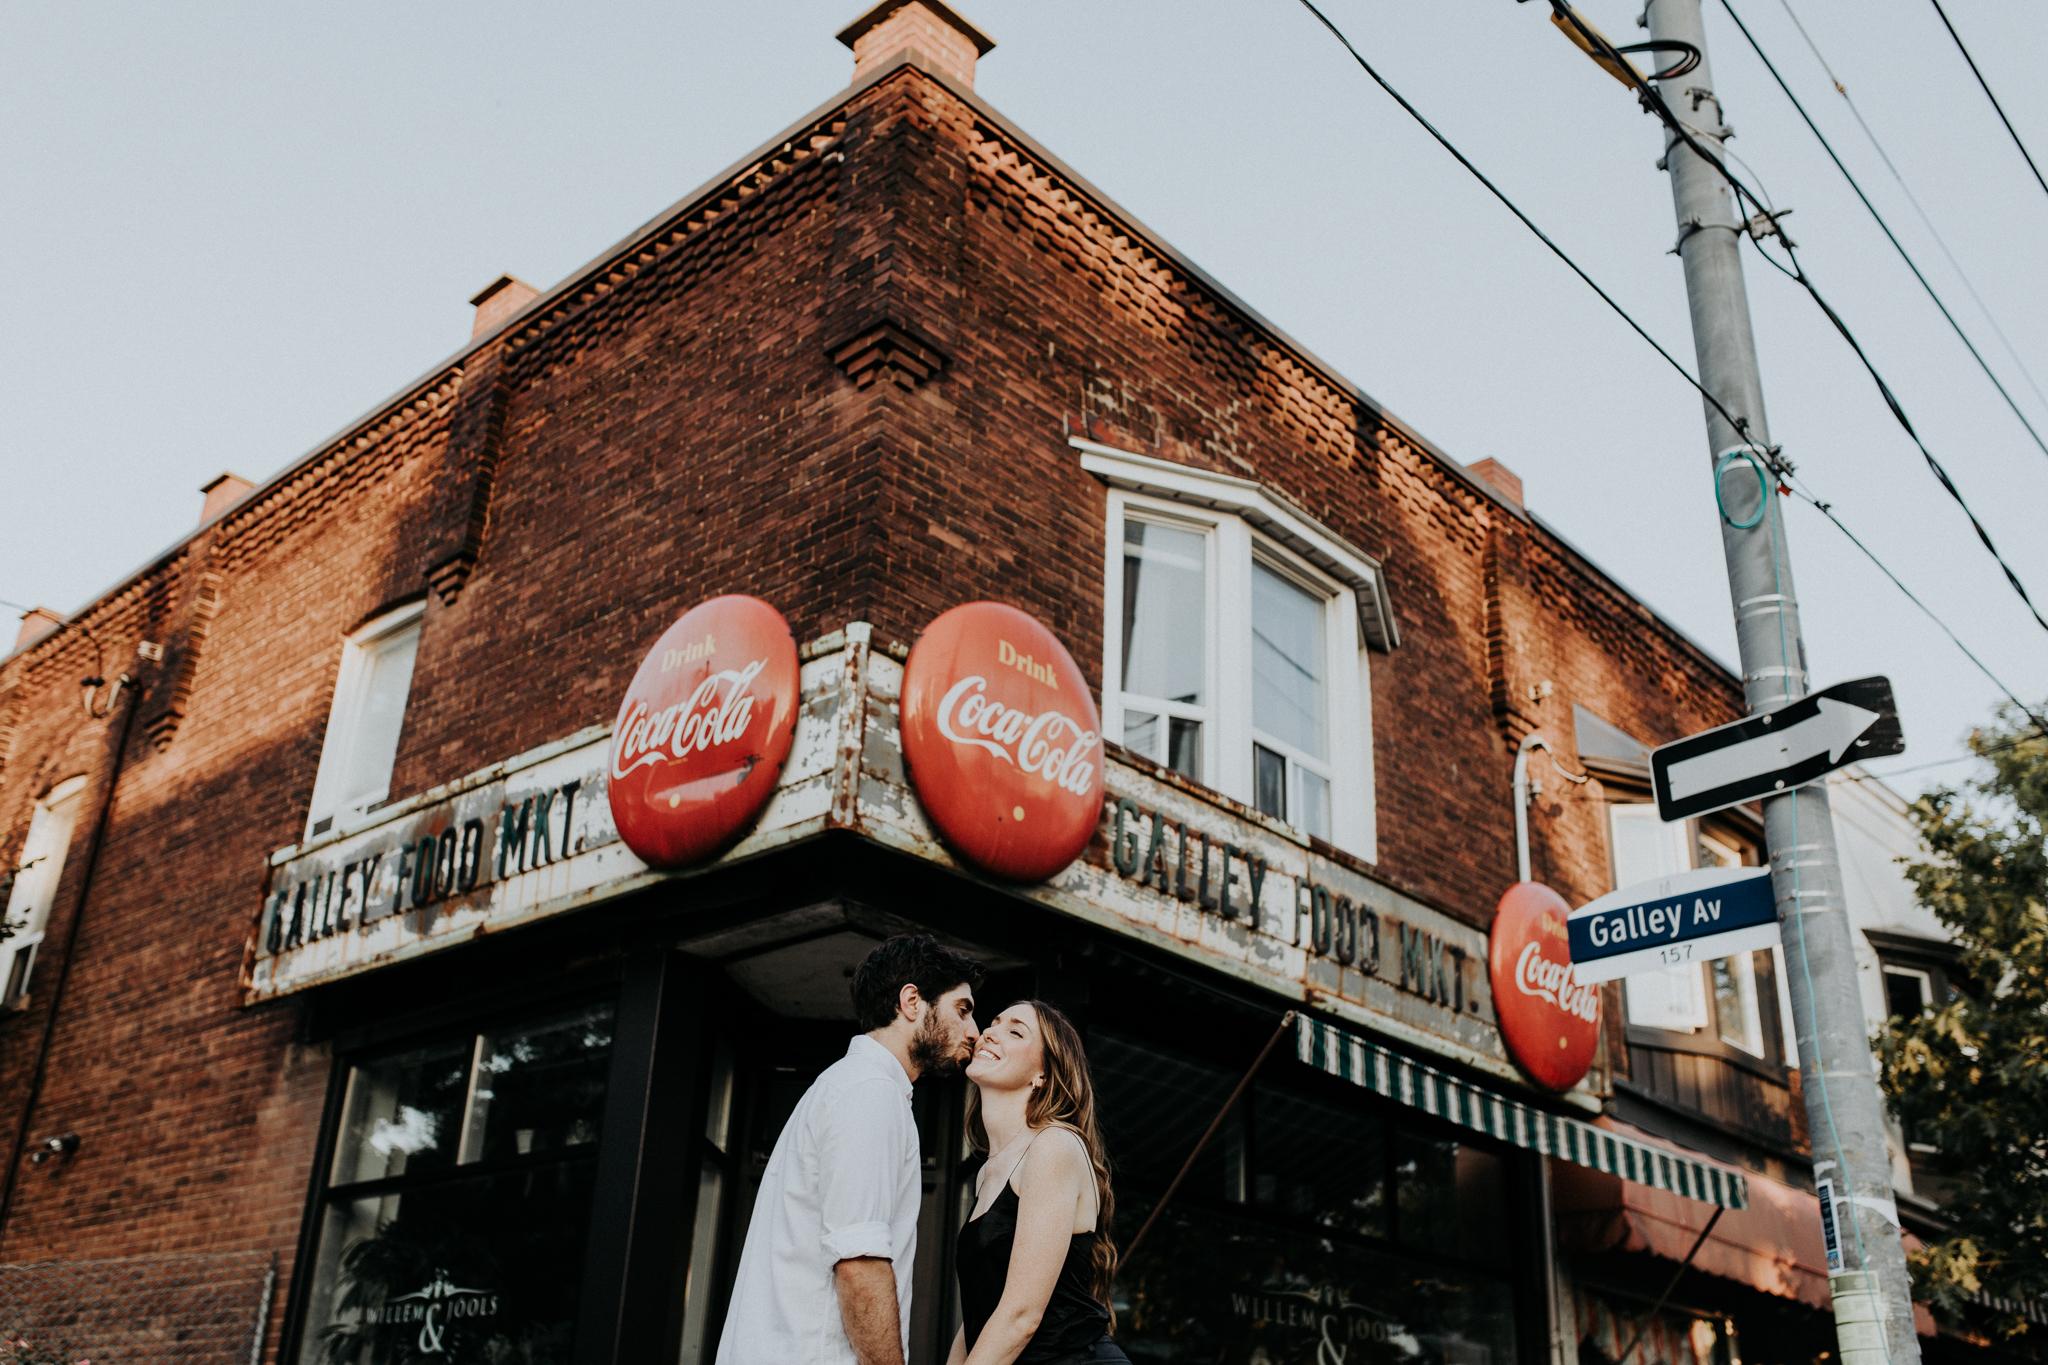 Gillian & Carlo - Toronto, ON